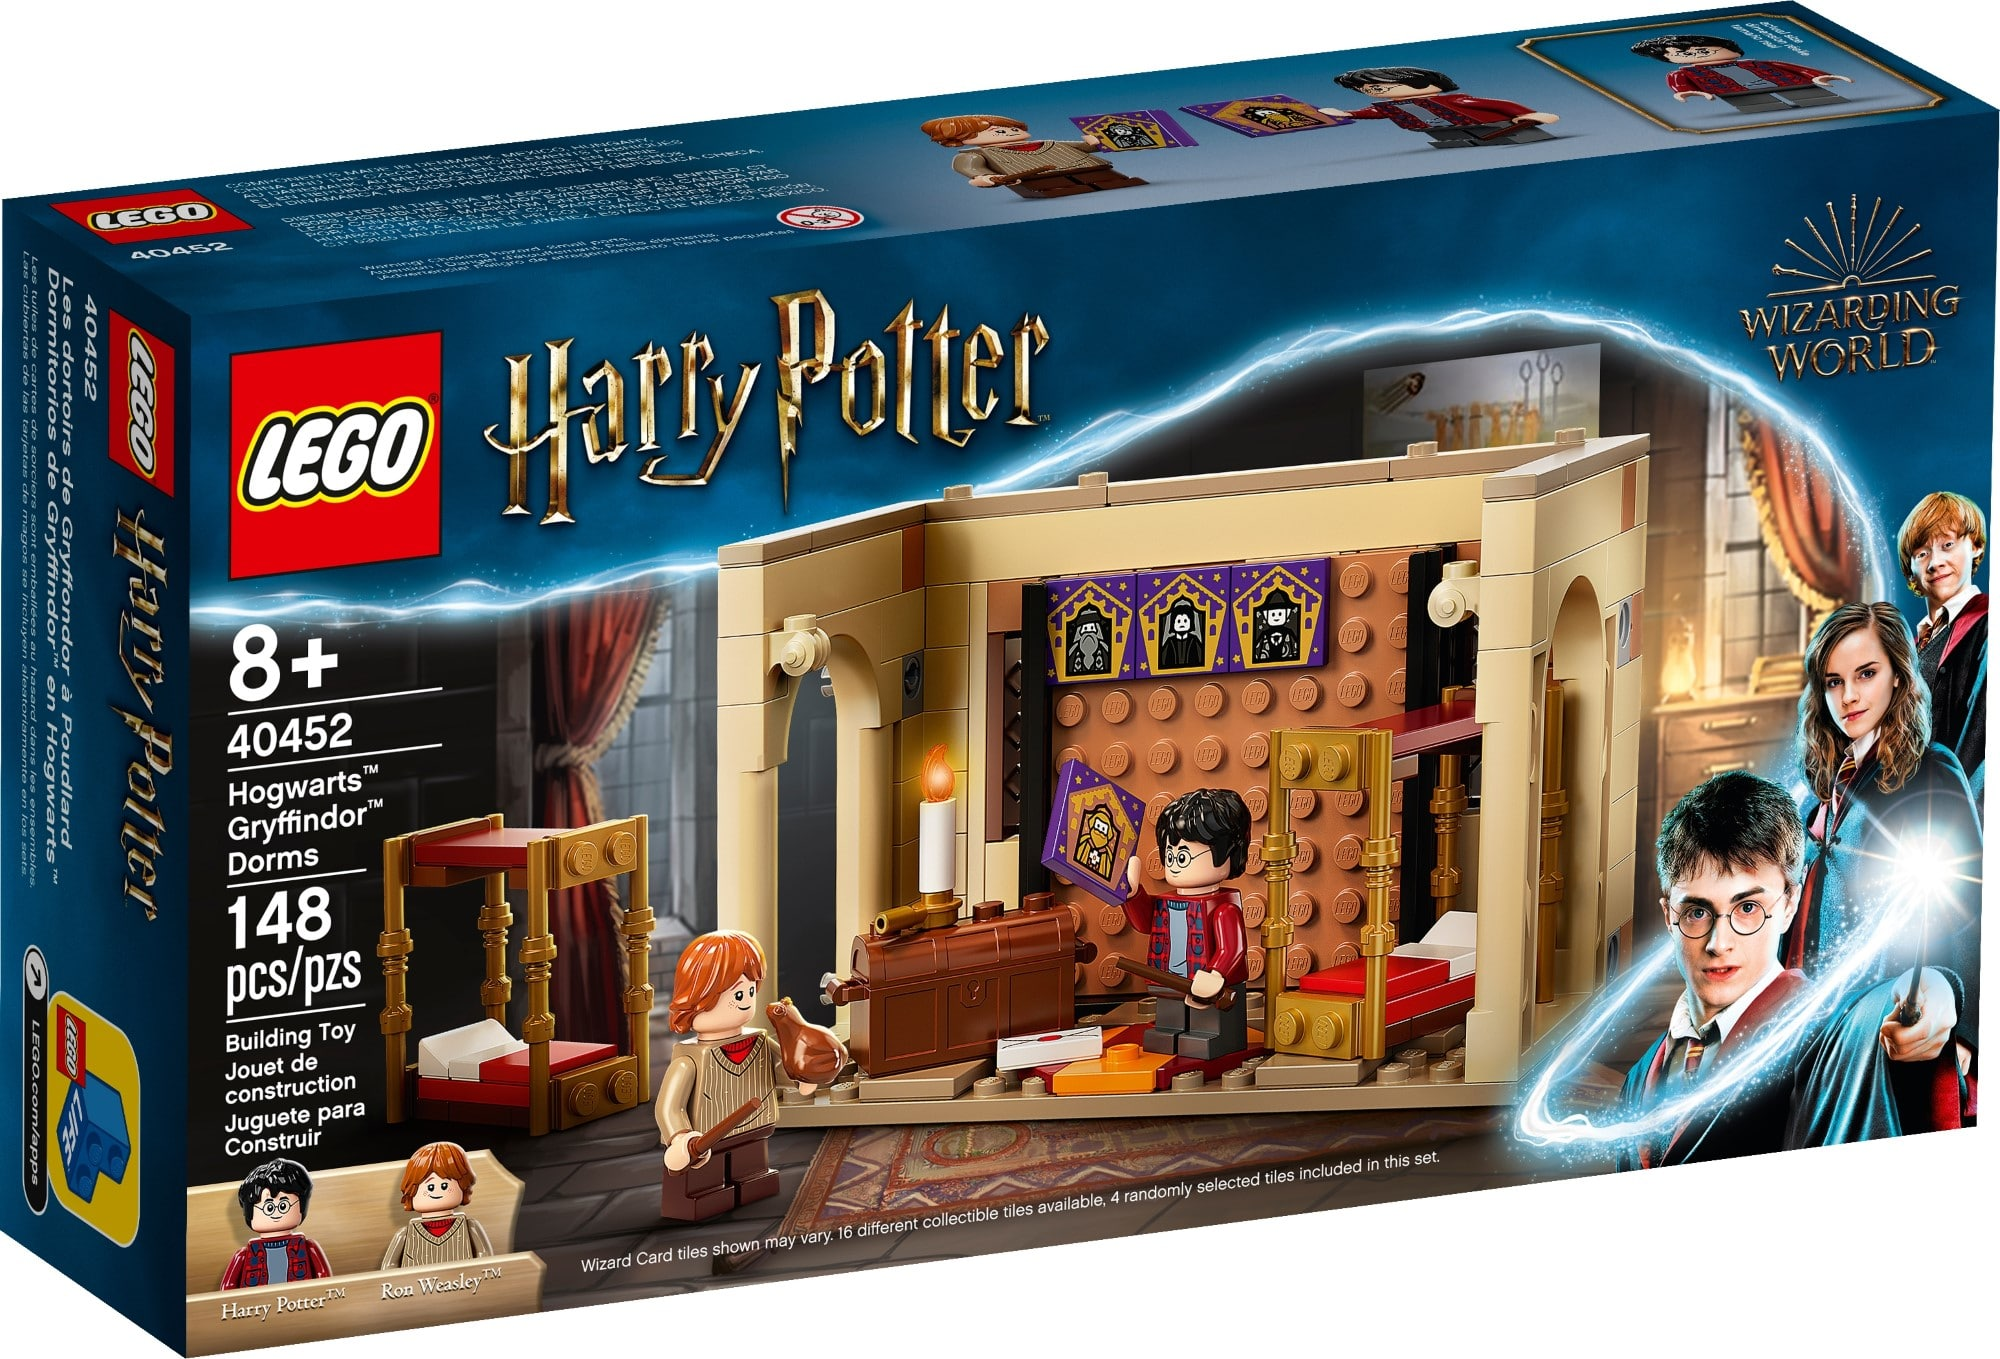 LEGO 40452 Hogwarts Gryffindor Schlafsäle 2